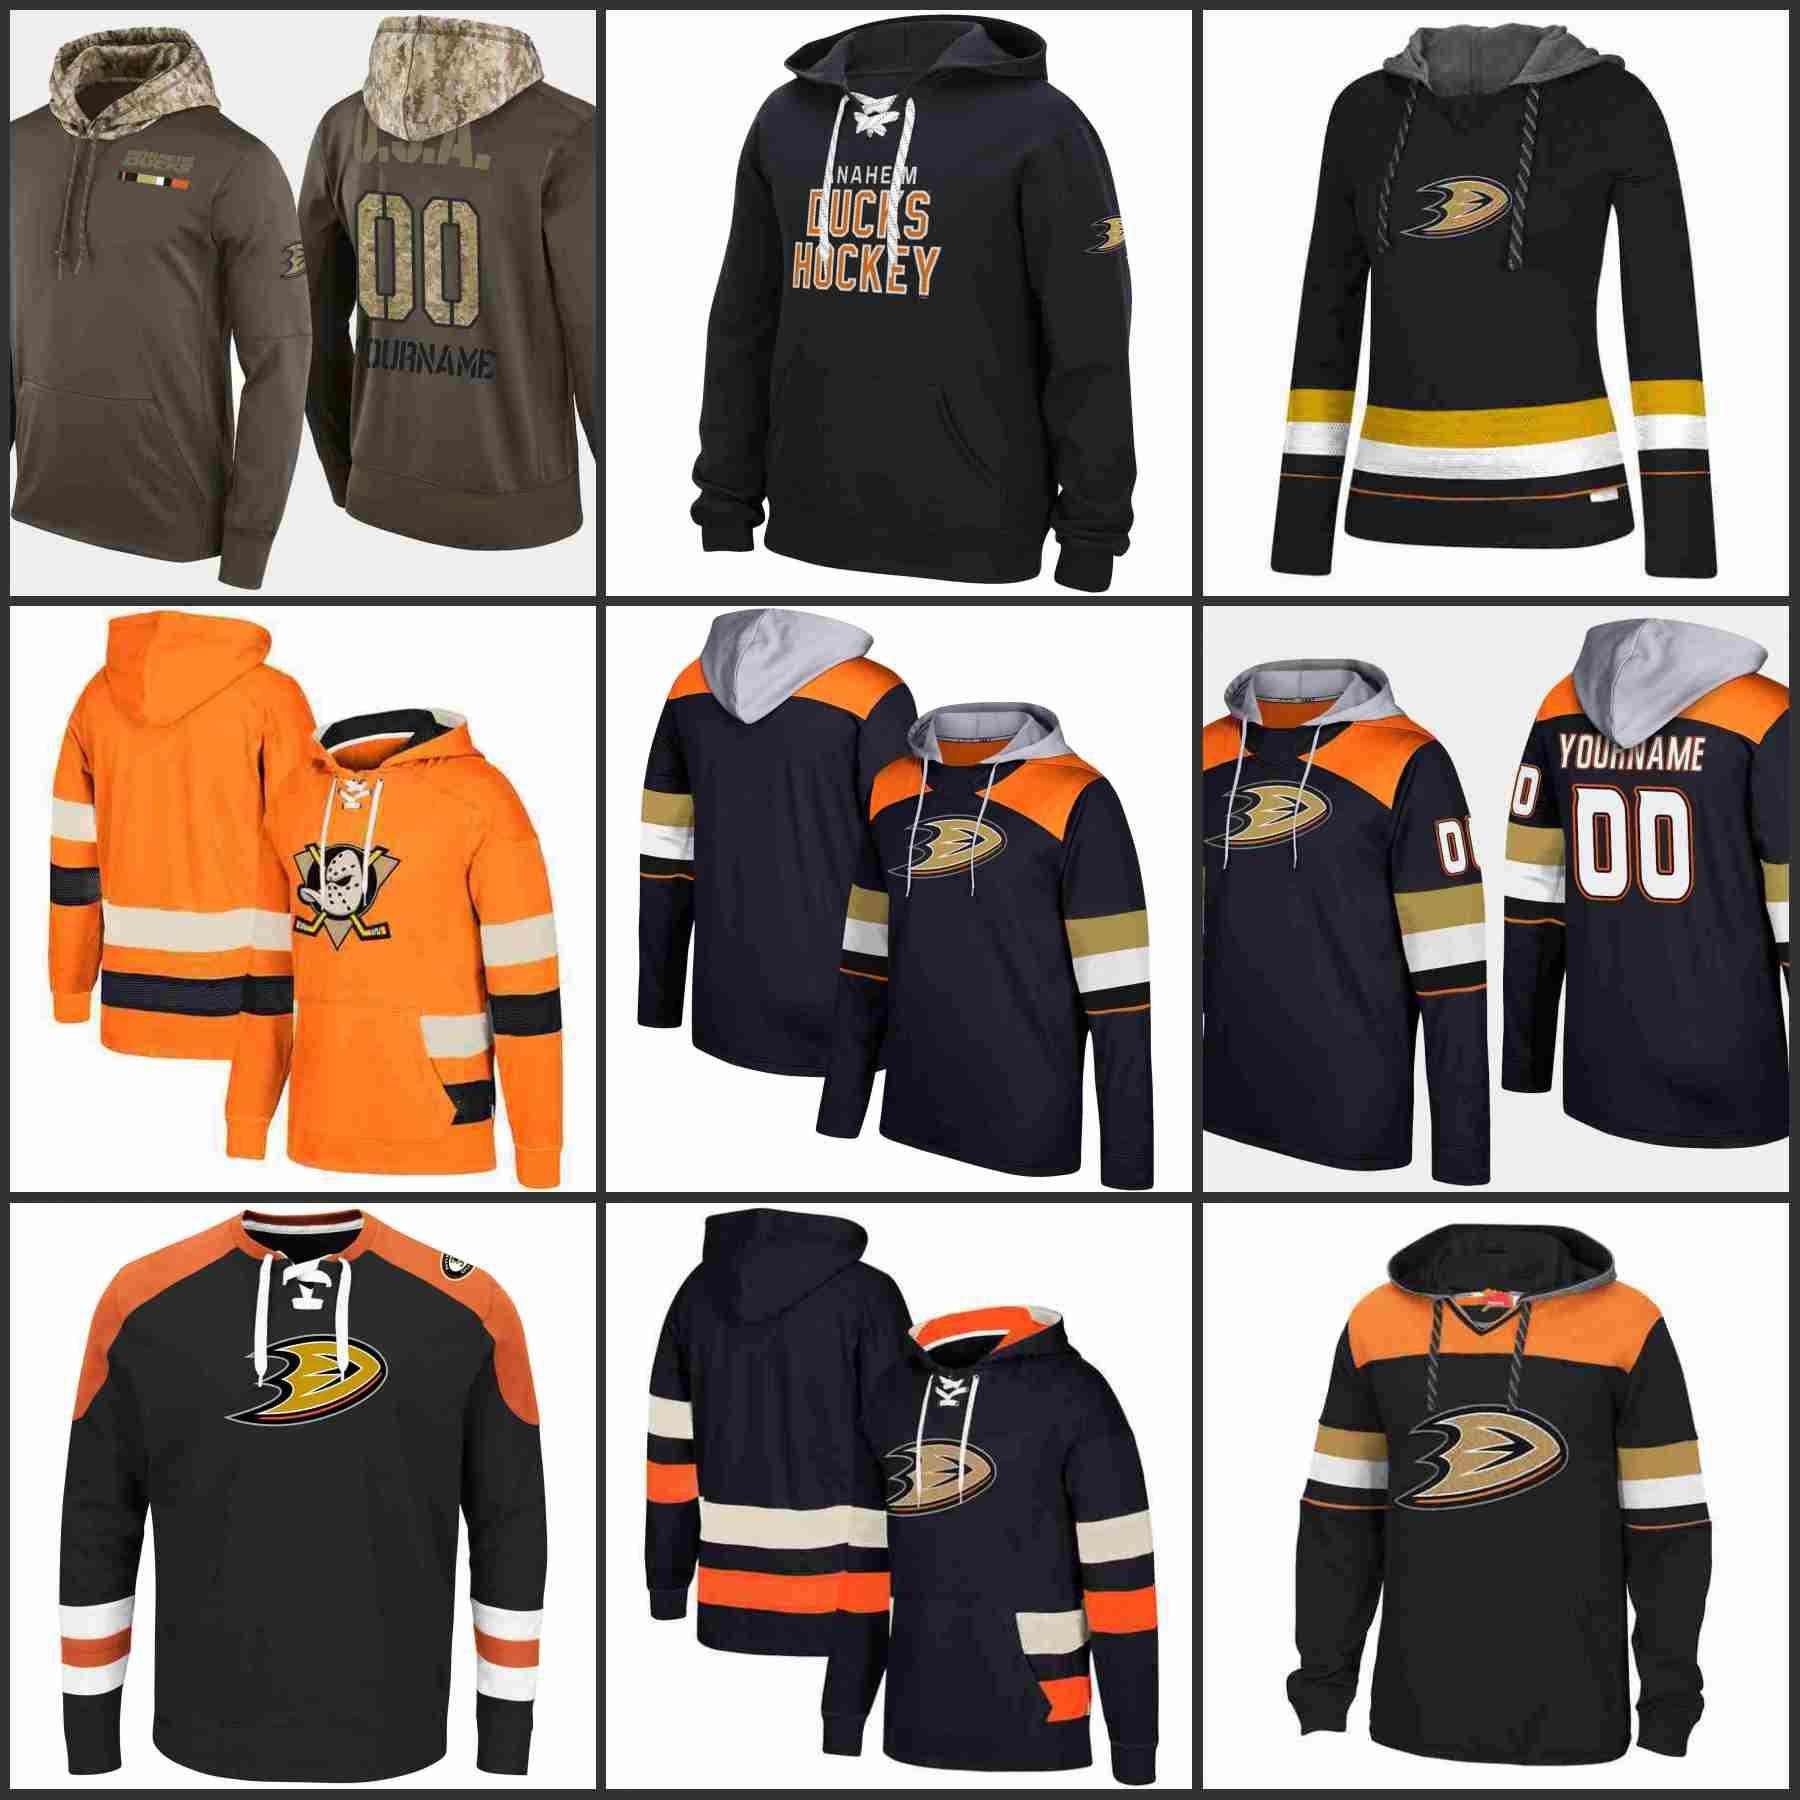 Anaheim Ducks Hoodies Teemu Selanne Paul Kariya Corey Perry Ryan Getzlaf Hockey  Jersey Sweatshirt Stitched Hockey Jerseys Online Online with  48.53 Piece  on ... f277b687e